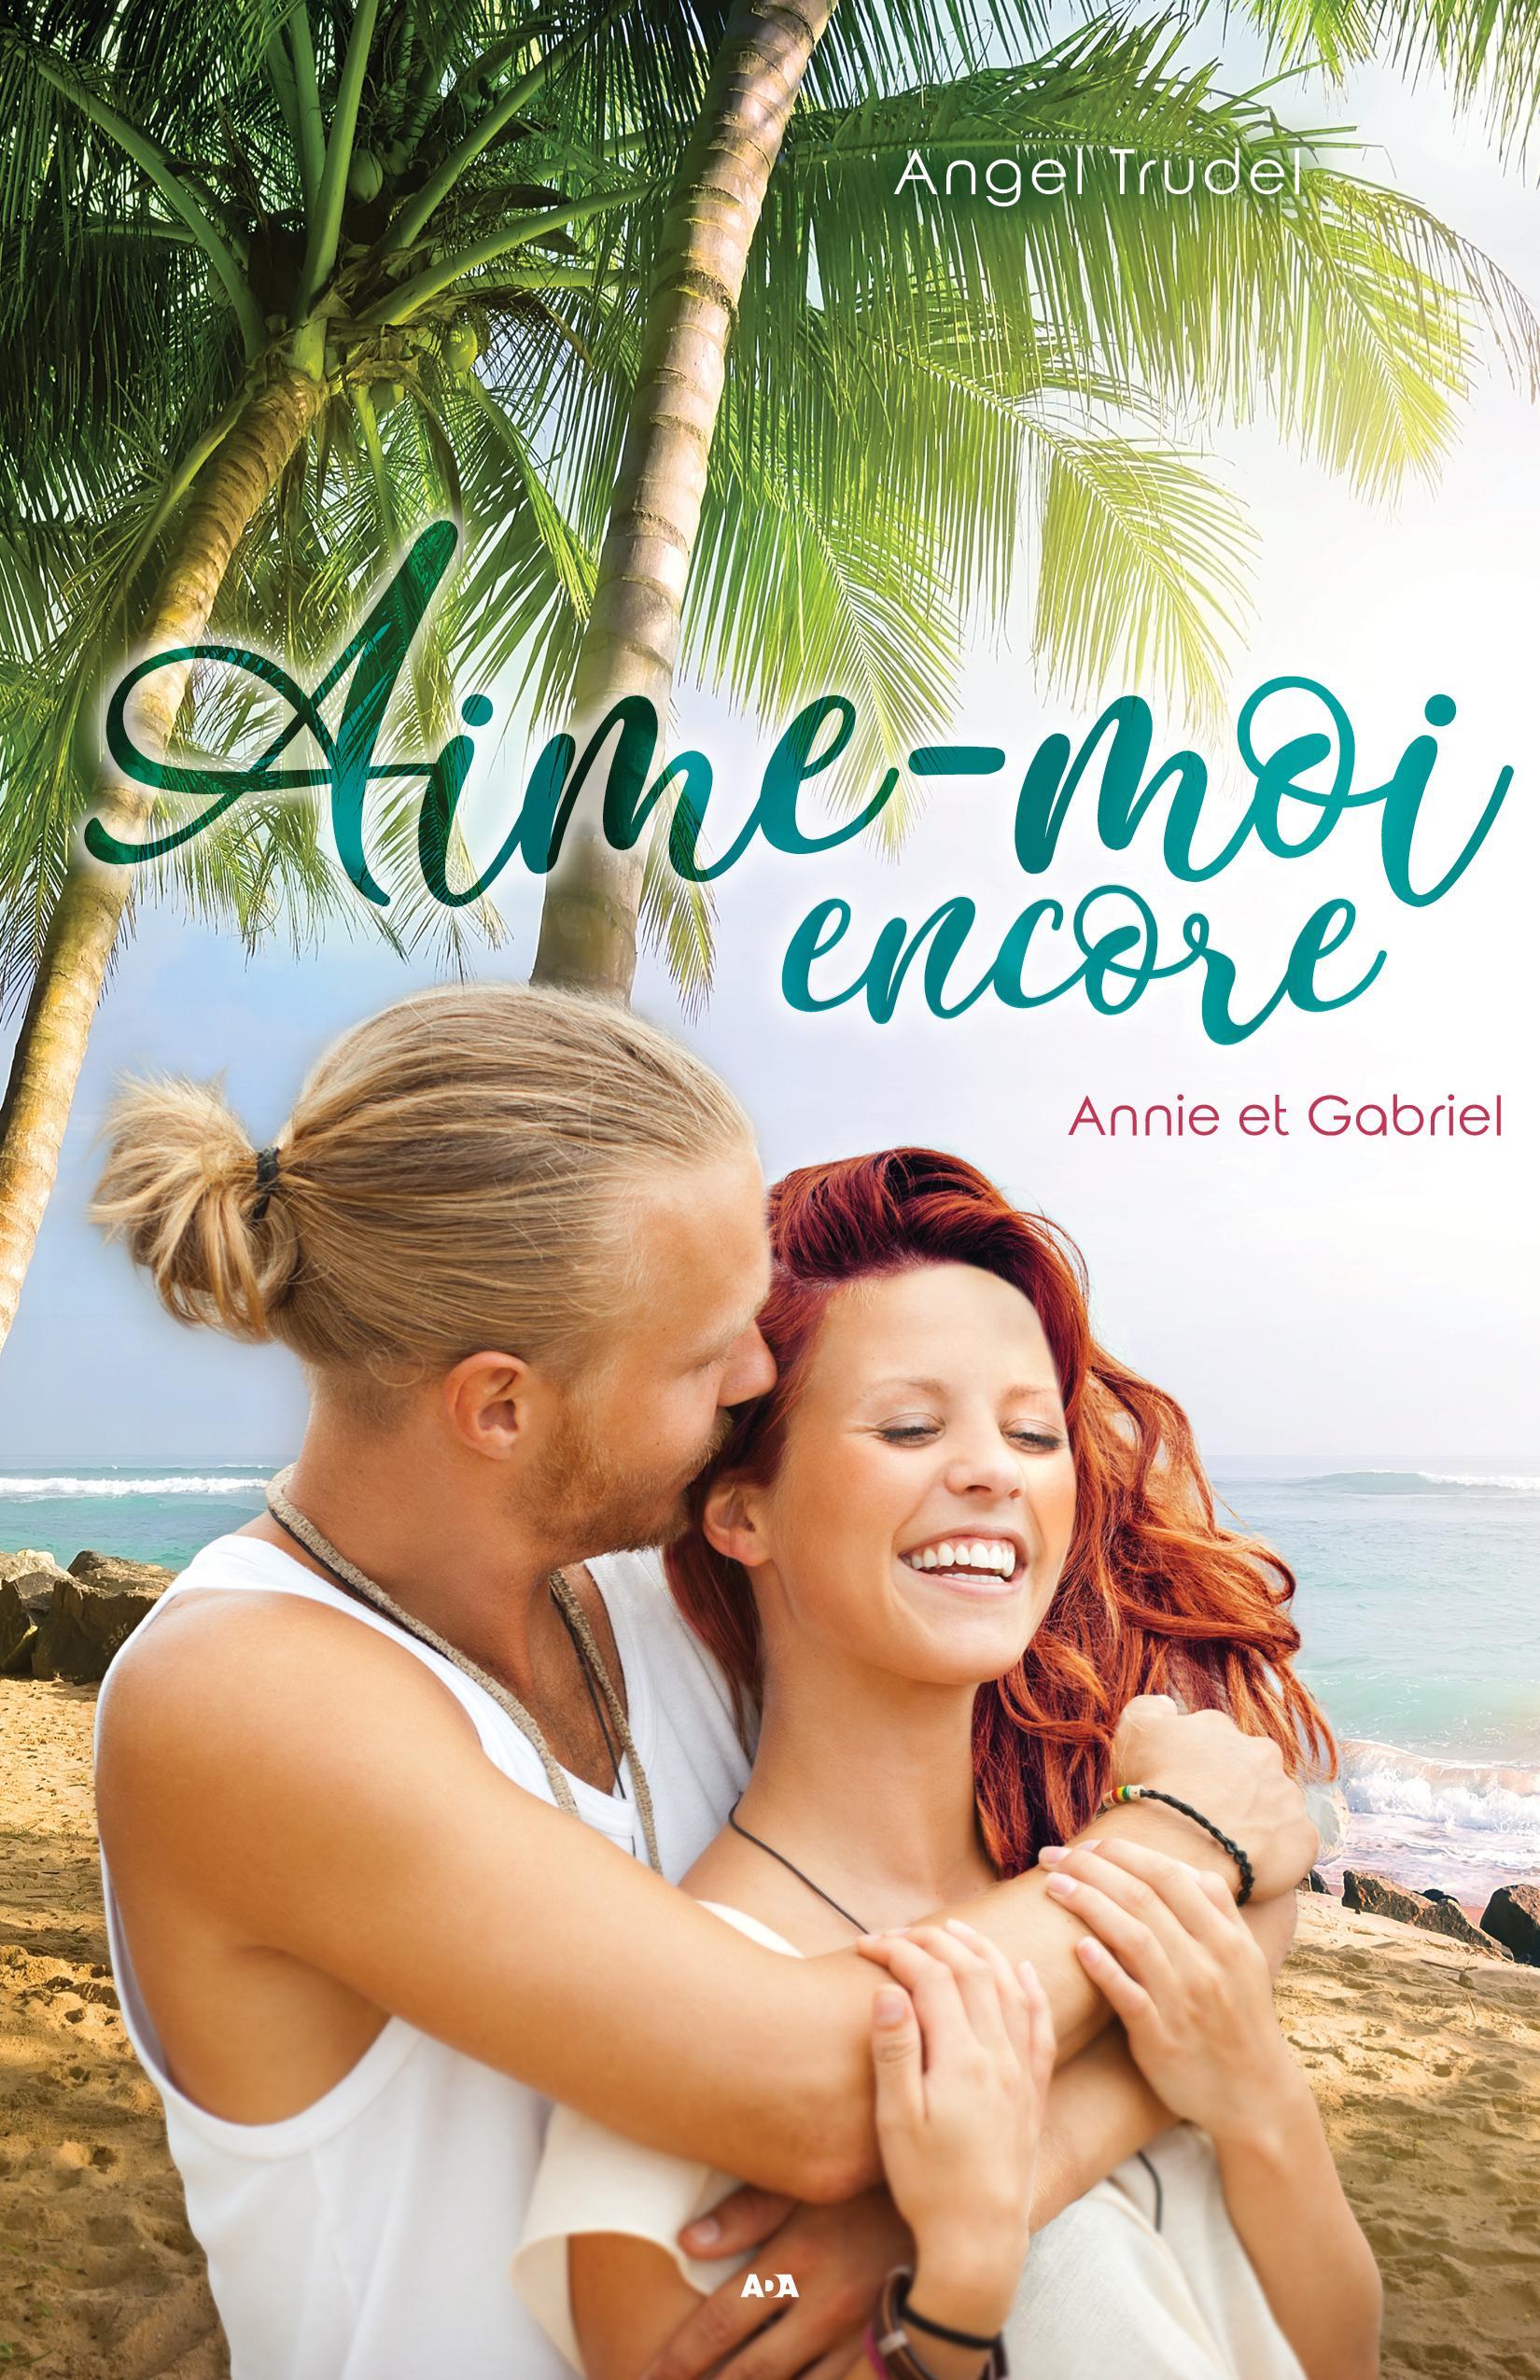 Annie et Gabriel